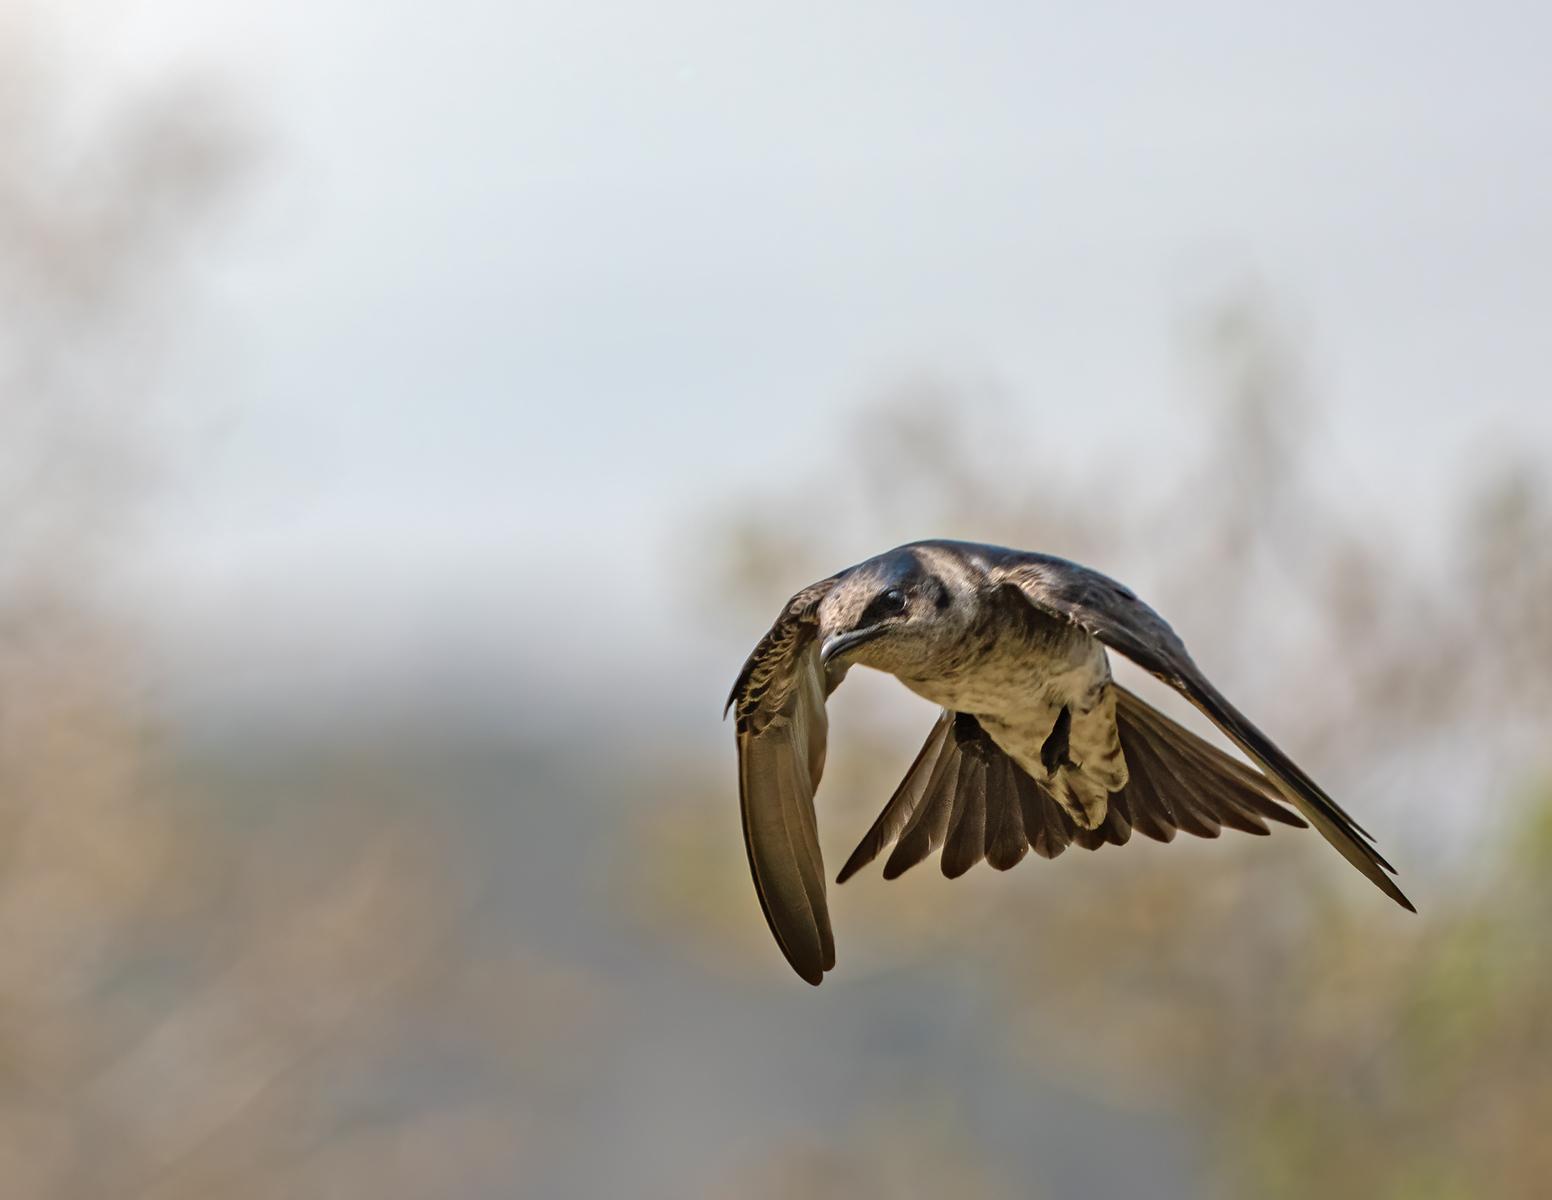 IMAGE: https://photos.smugmug.com/Private/n-XQ9MPw/Birds/Birds/i-Vvcx4km/0/89f82e94/X3/Purple%20martin_R3_4-2021-5-X3.jpg